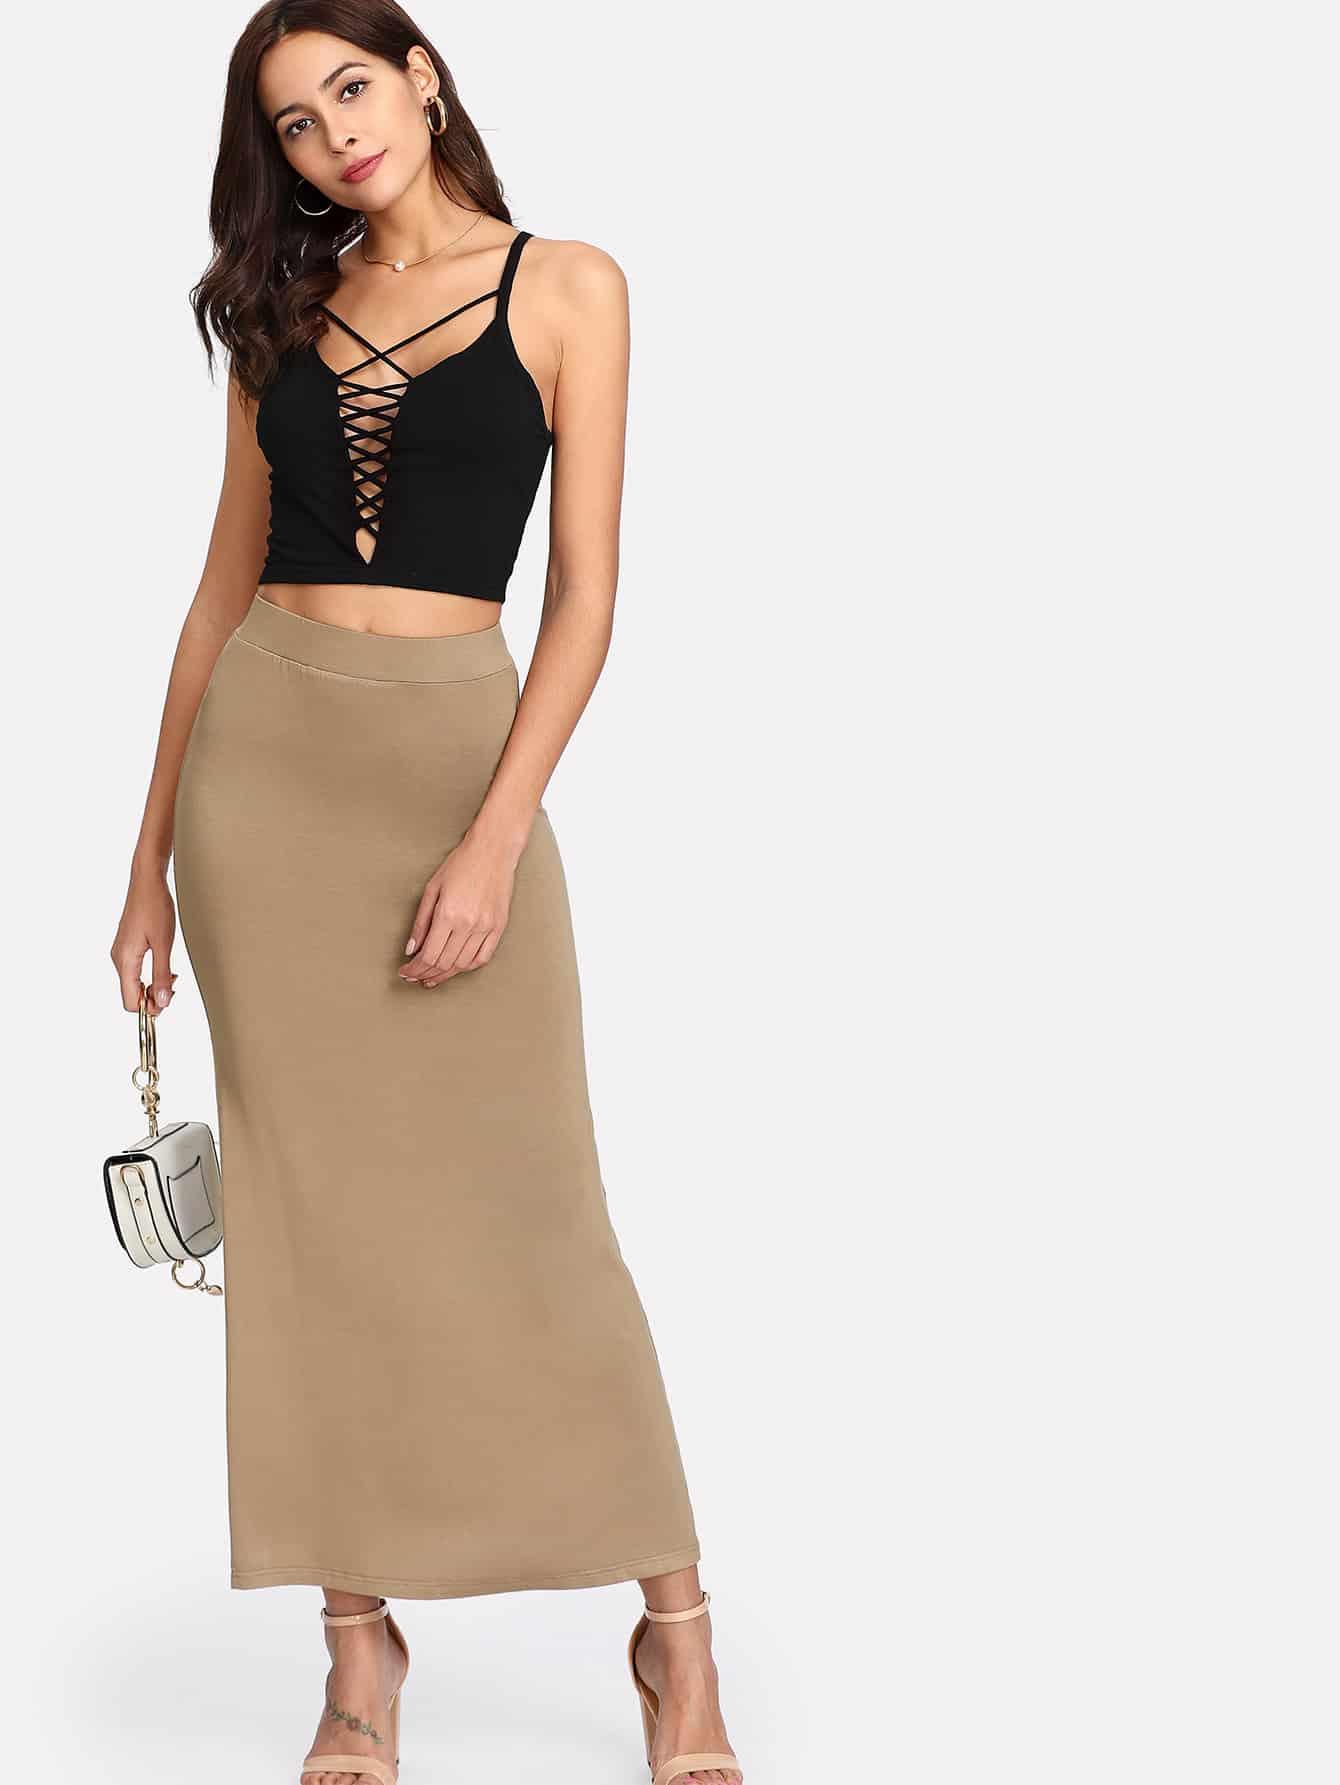 Elastic Waist Longline Jersey Skirt джеймс эшер bhakta ranga rasa india новый взгляд mp3